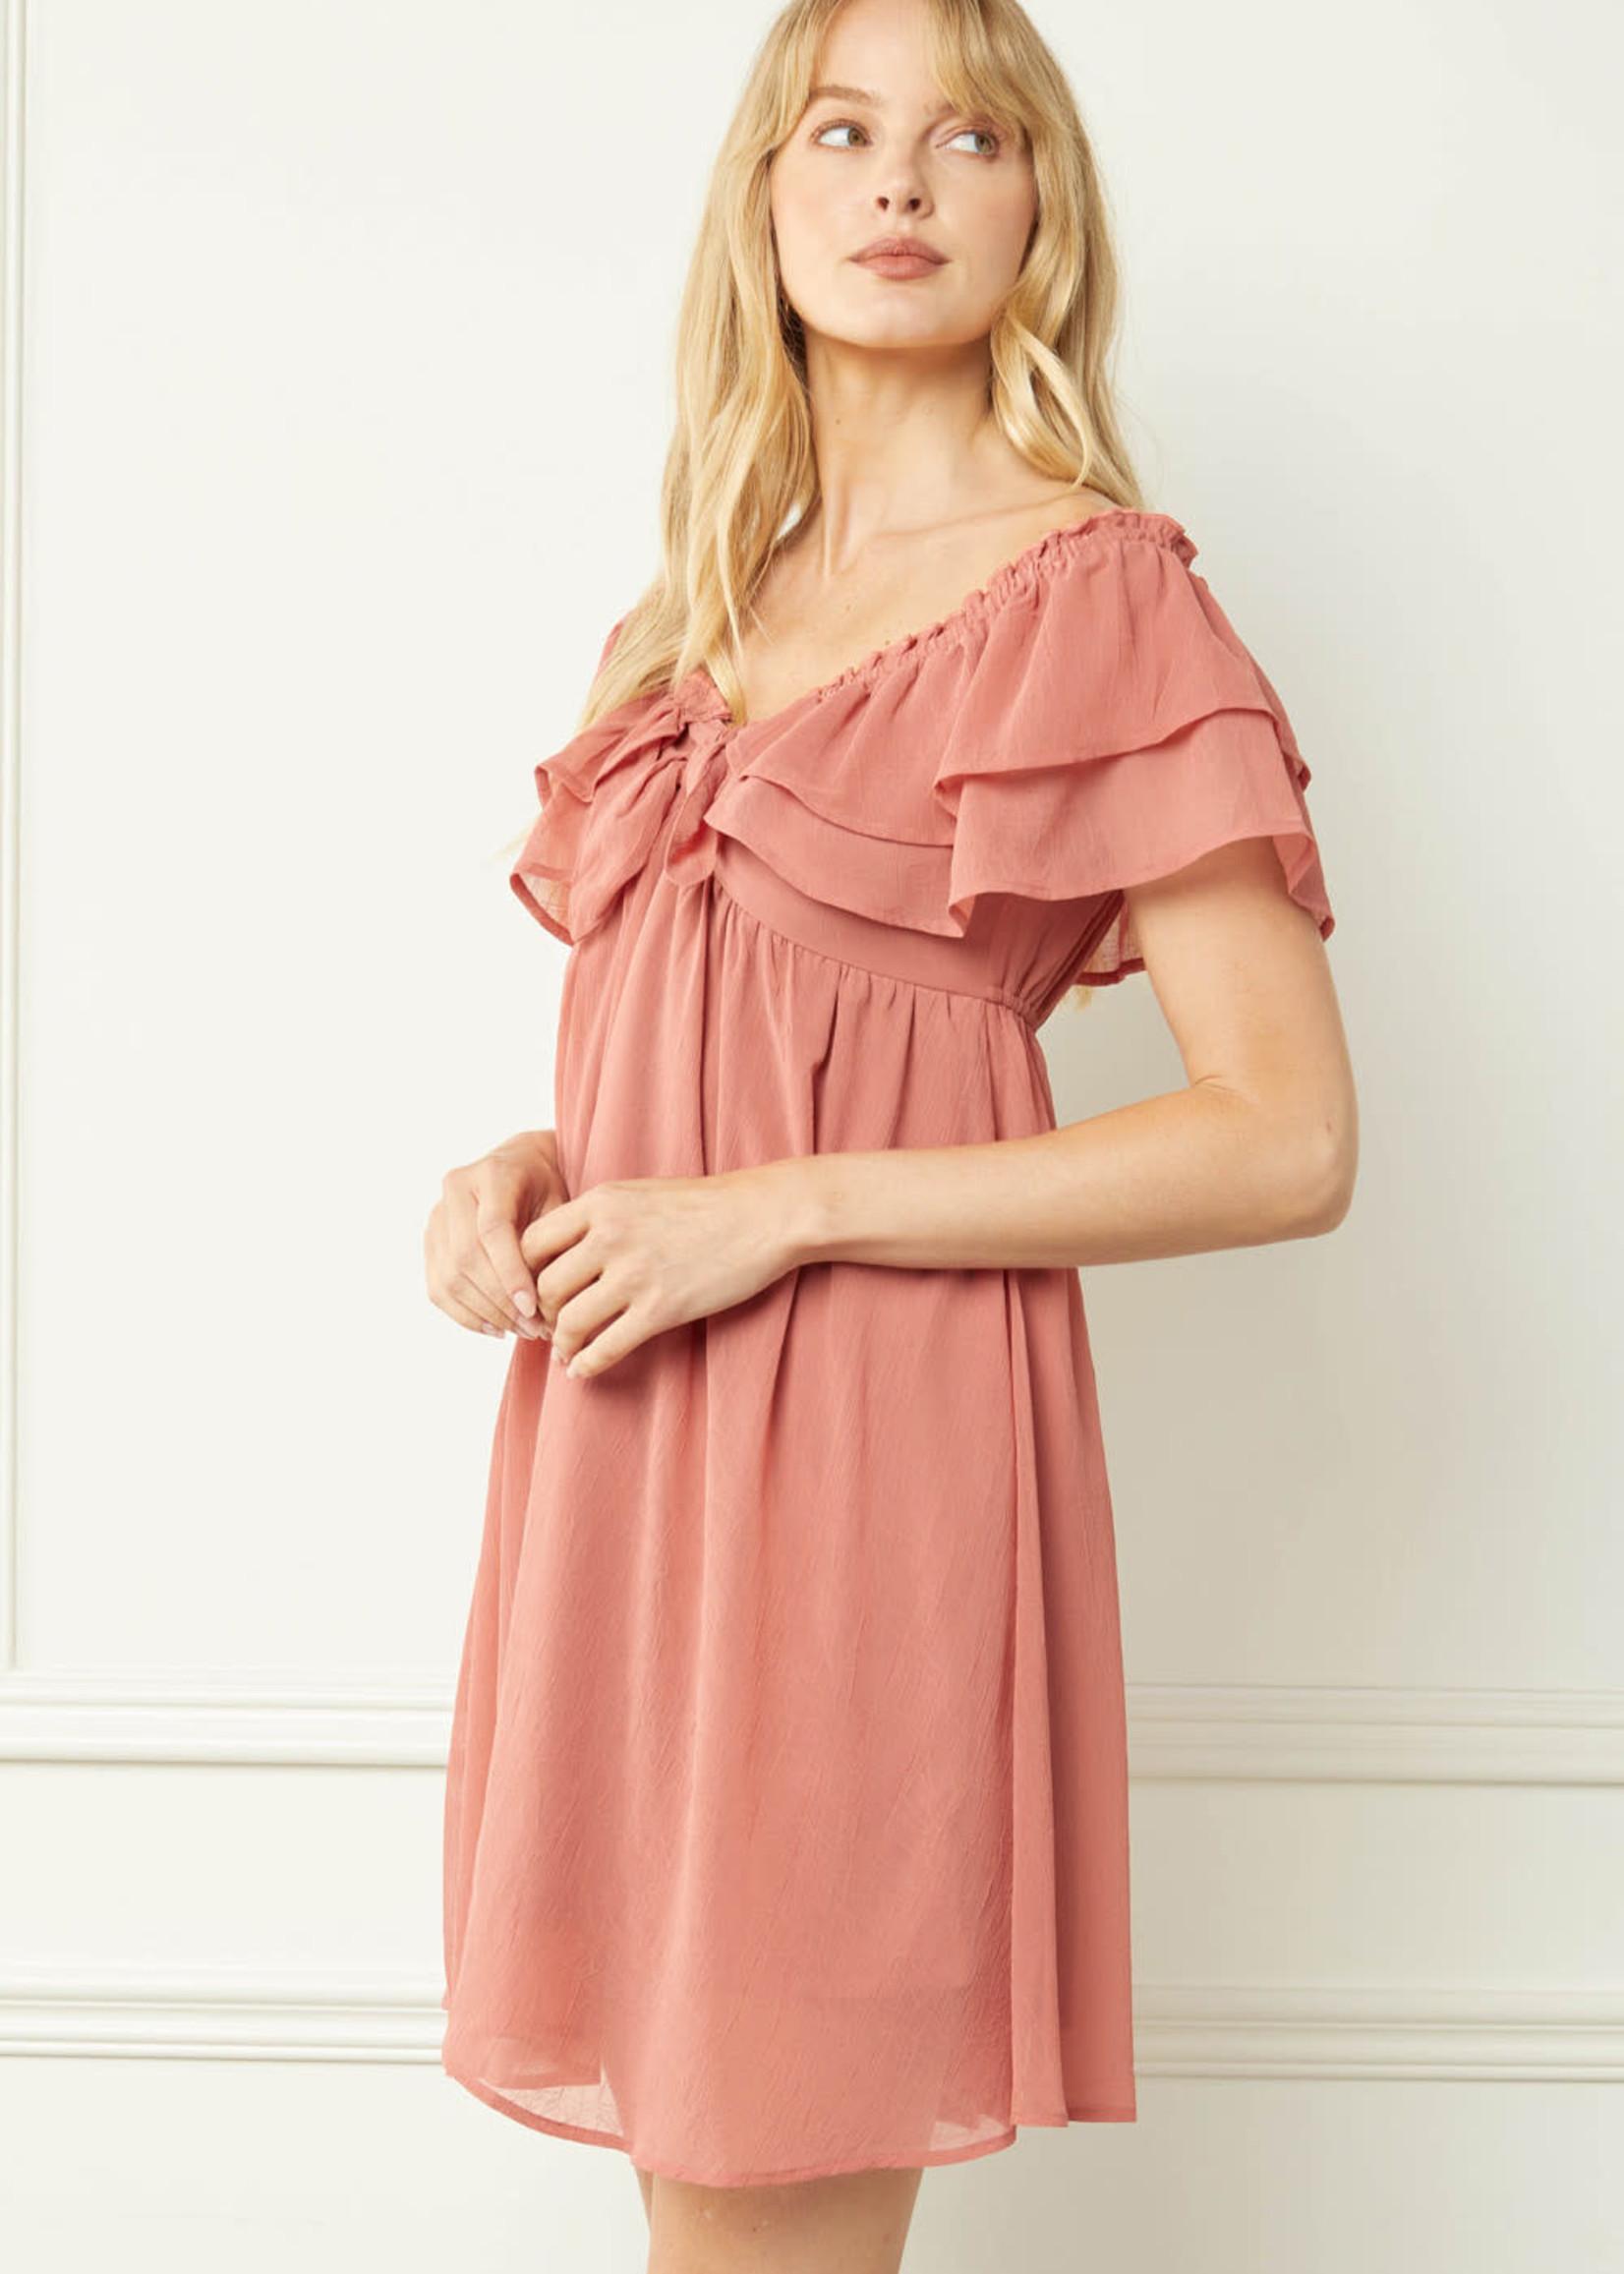 Fall For Me Ruffle Dress (2 Colors)